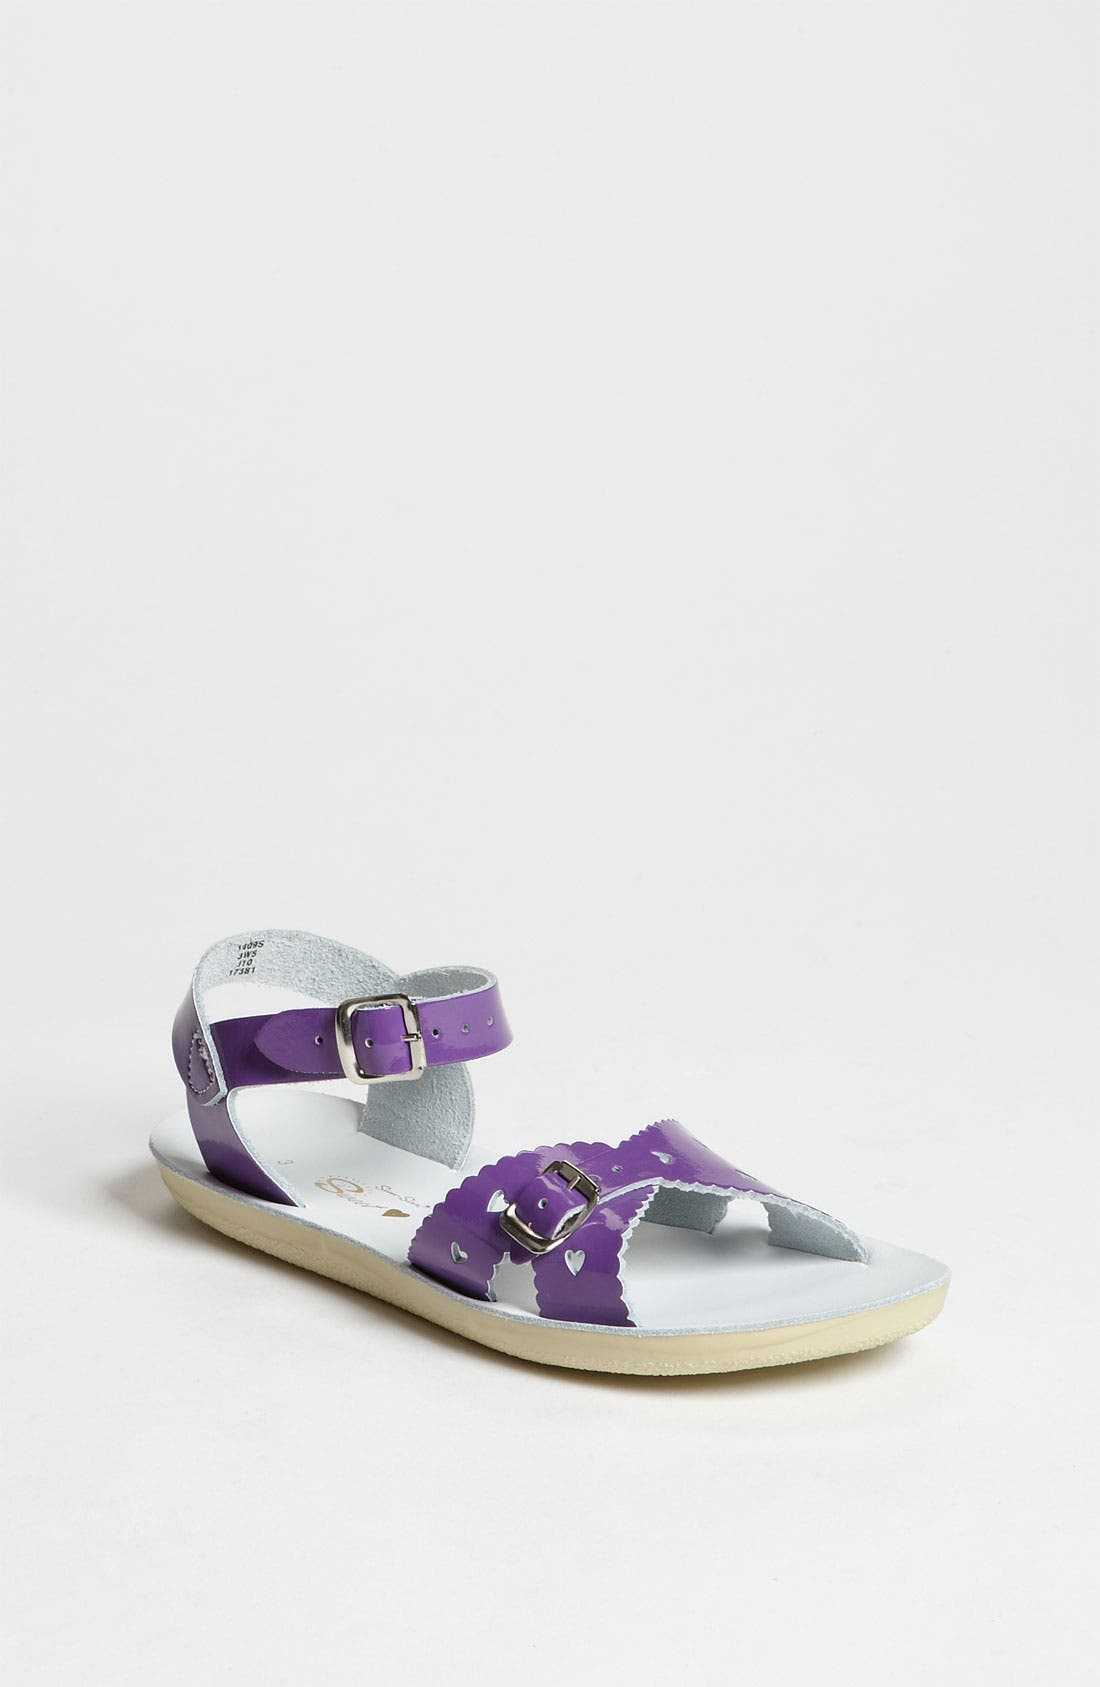 Main Image - Salt Water Sandals by Hoy 'Sweetheart' Sandal (Walker, Toddler & Little Kid)